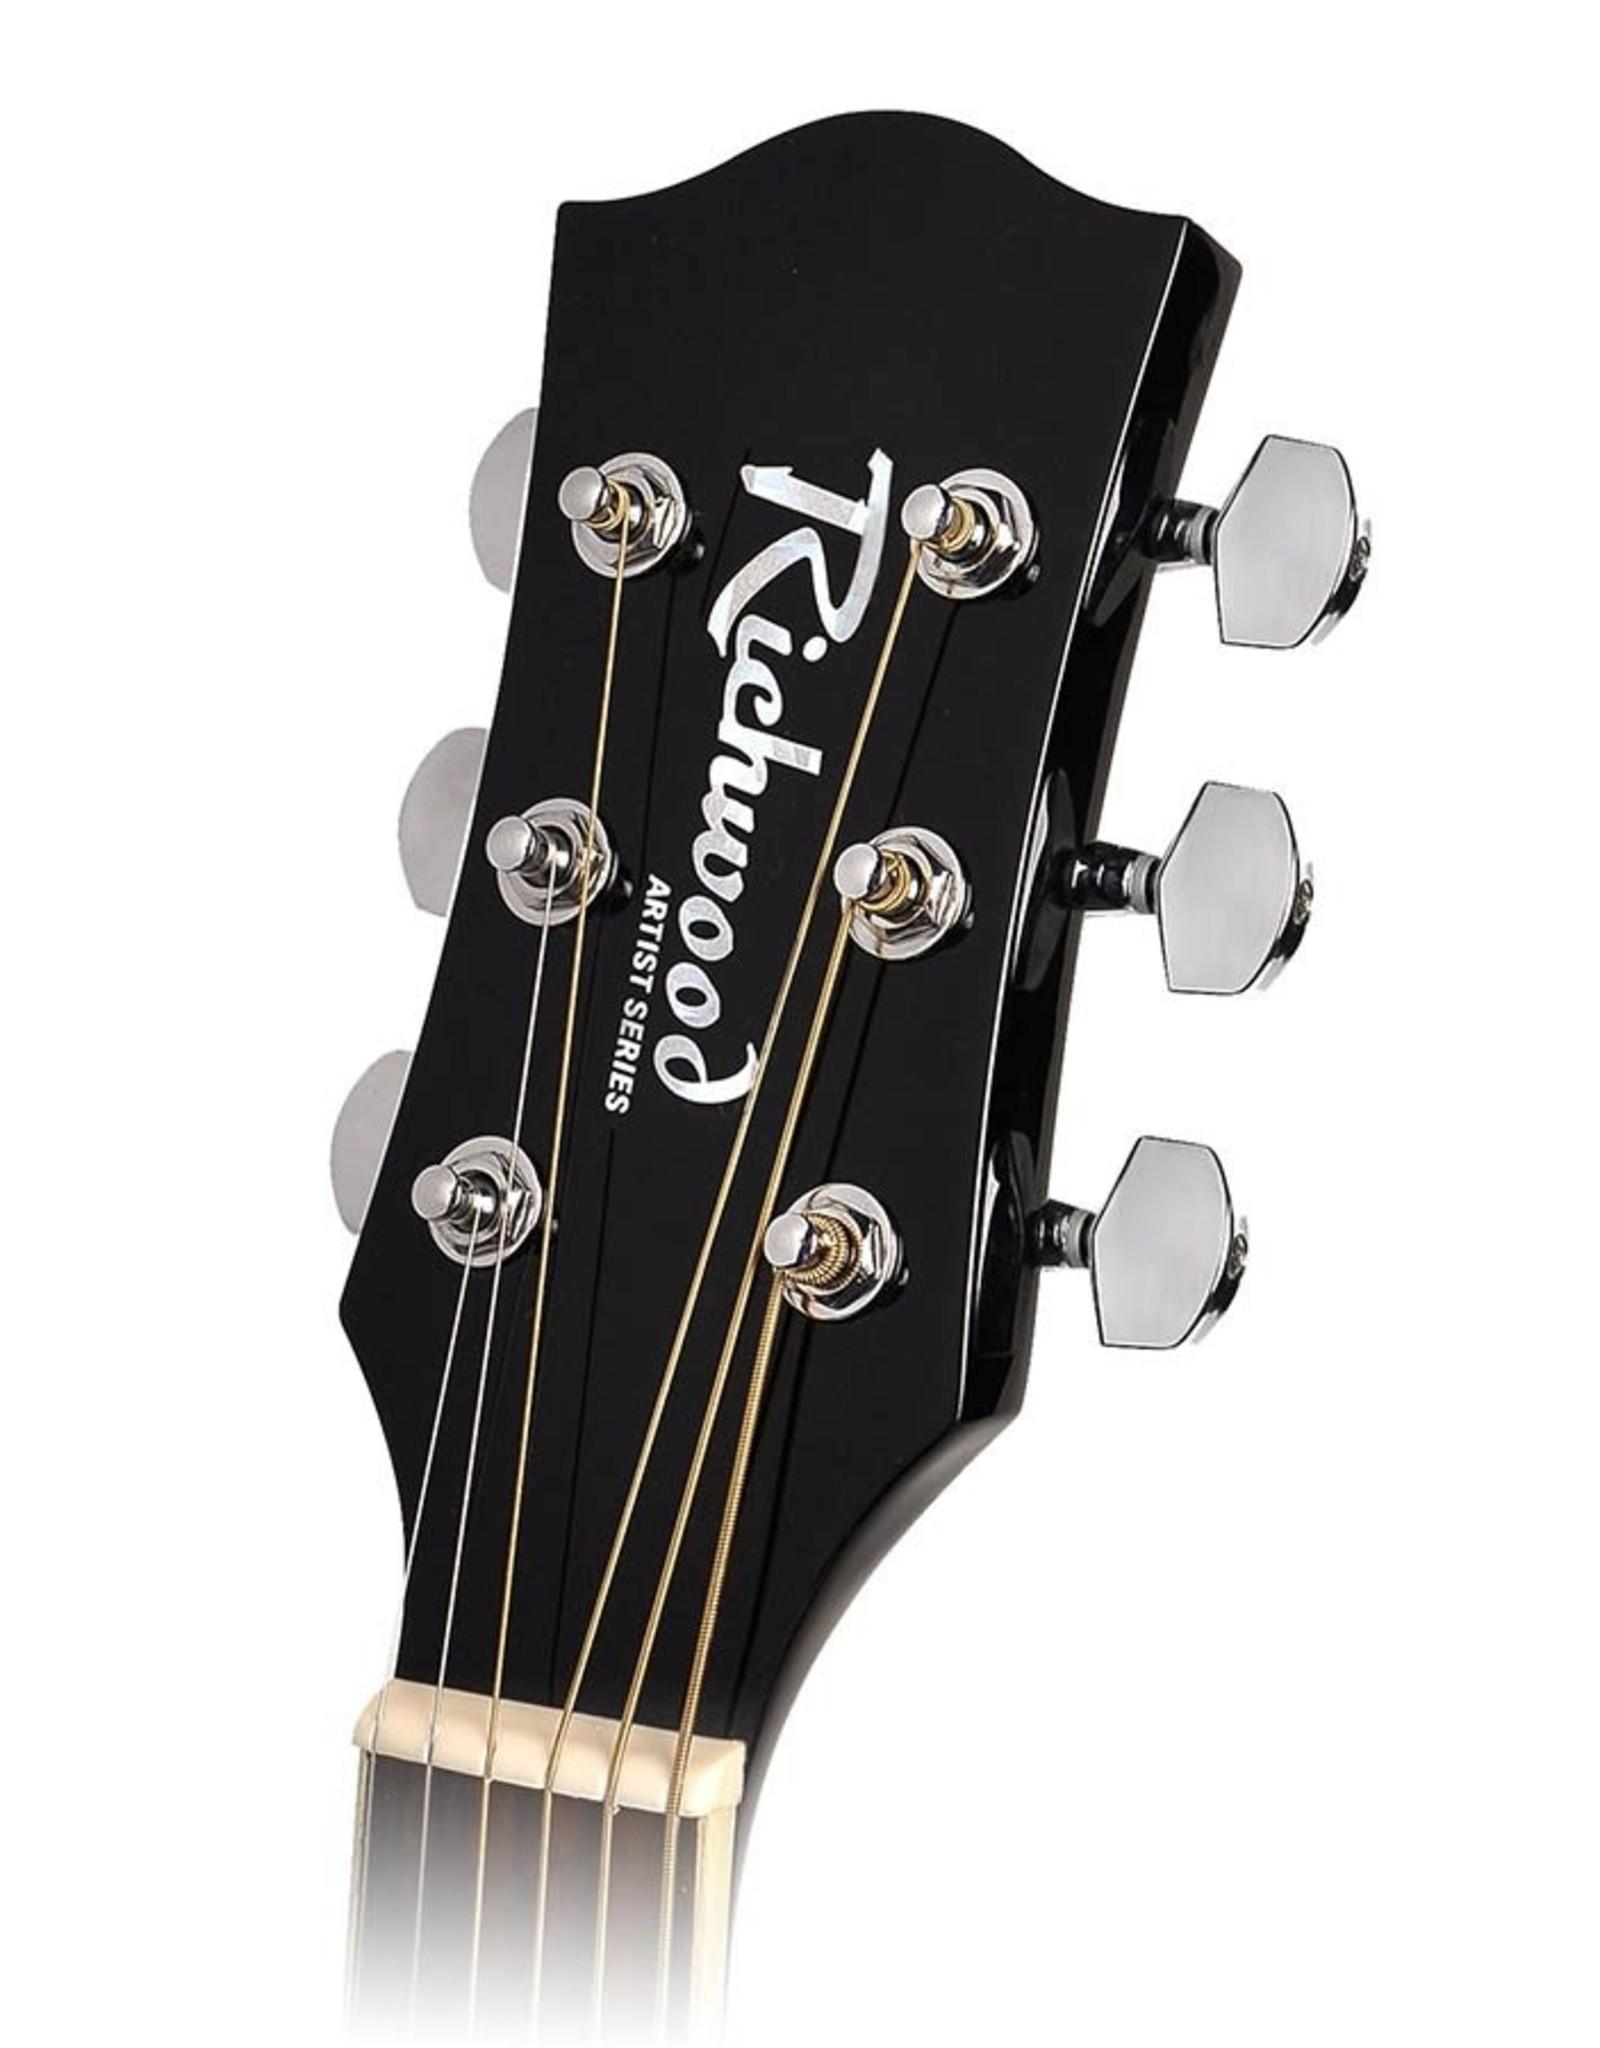 Richwood Richwood RD-12 Linkshandig Black